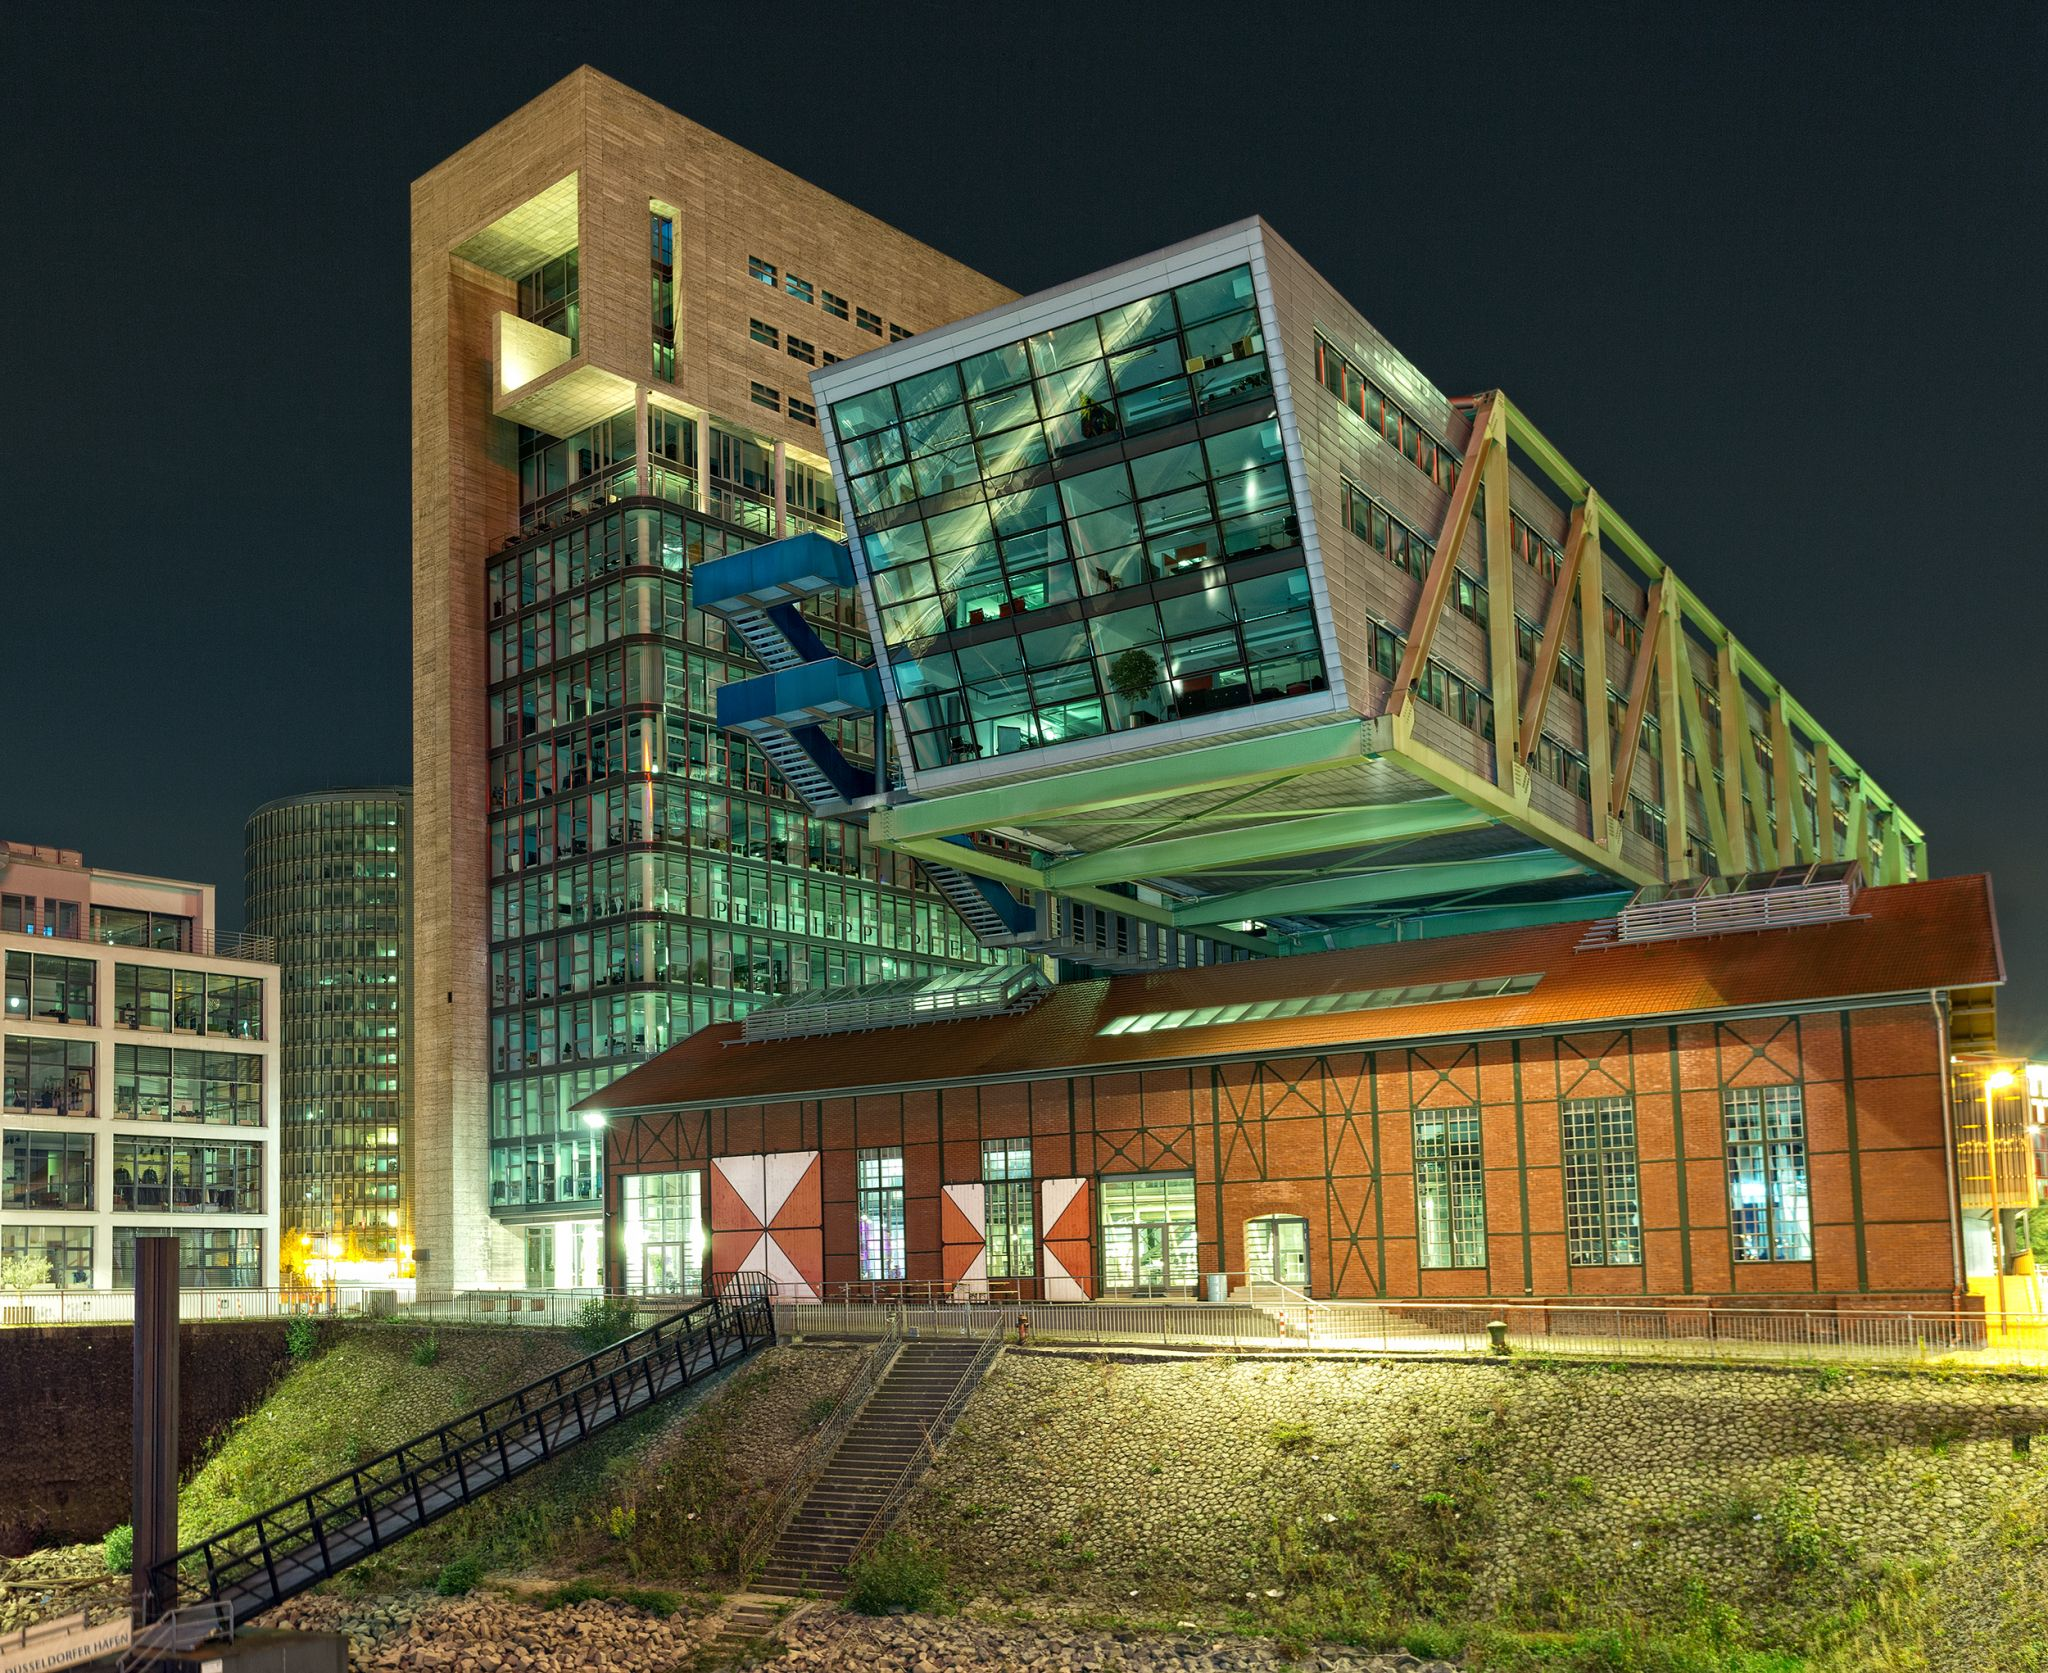 Port event center, Germany